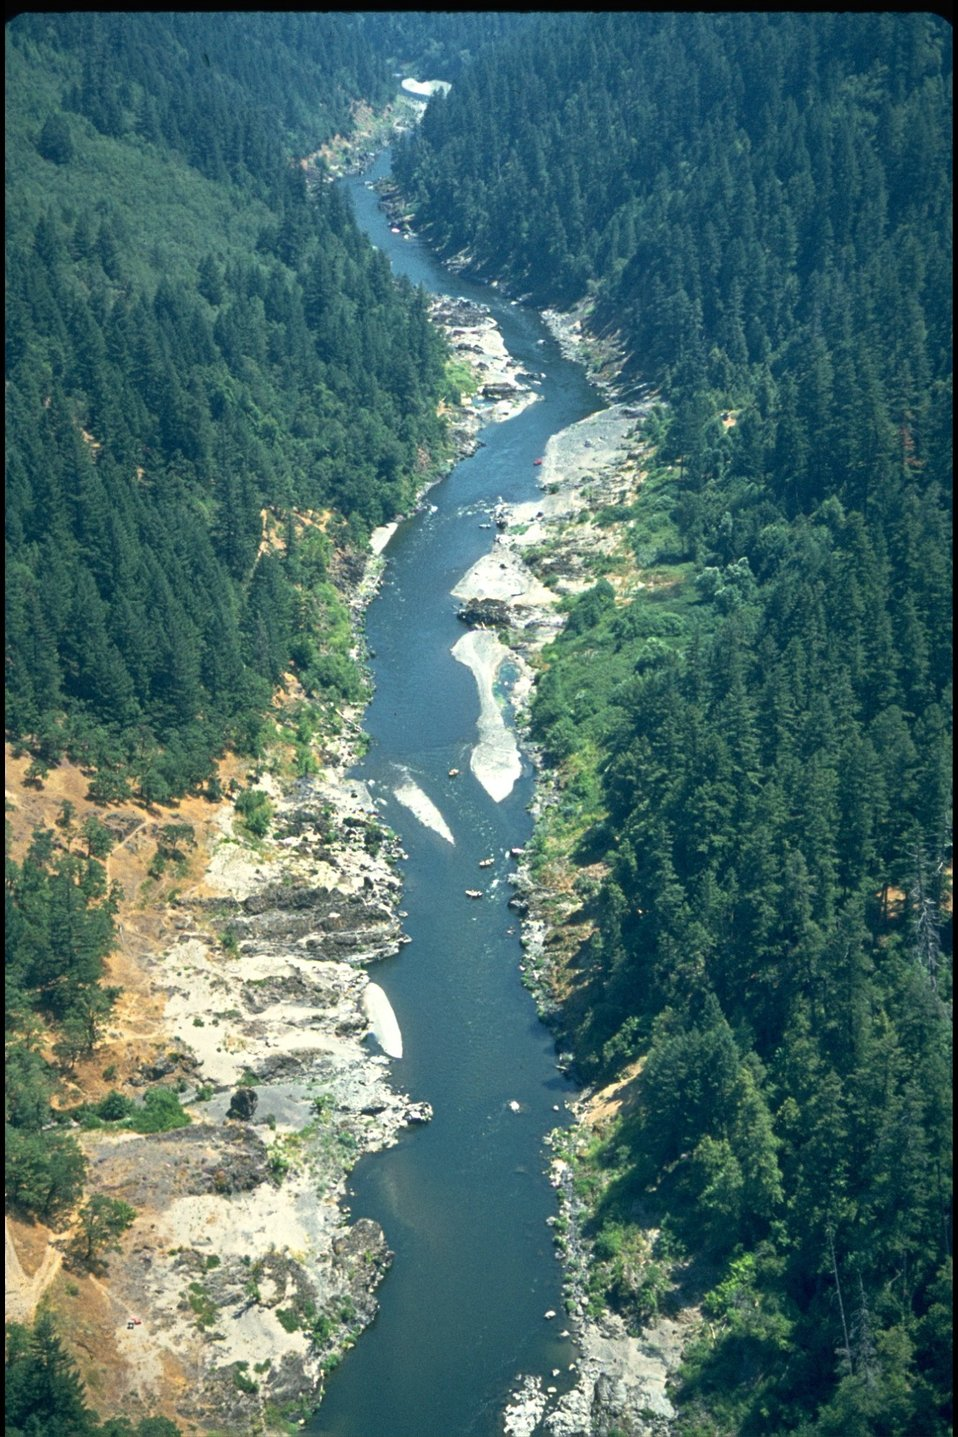 Rogue River - Quail Creek, wild section.